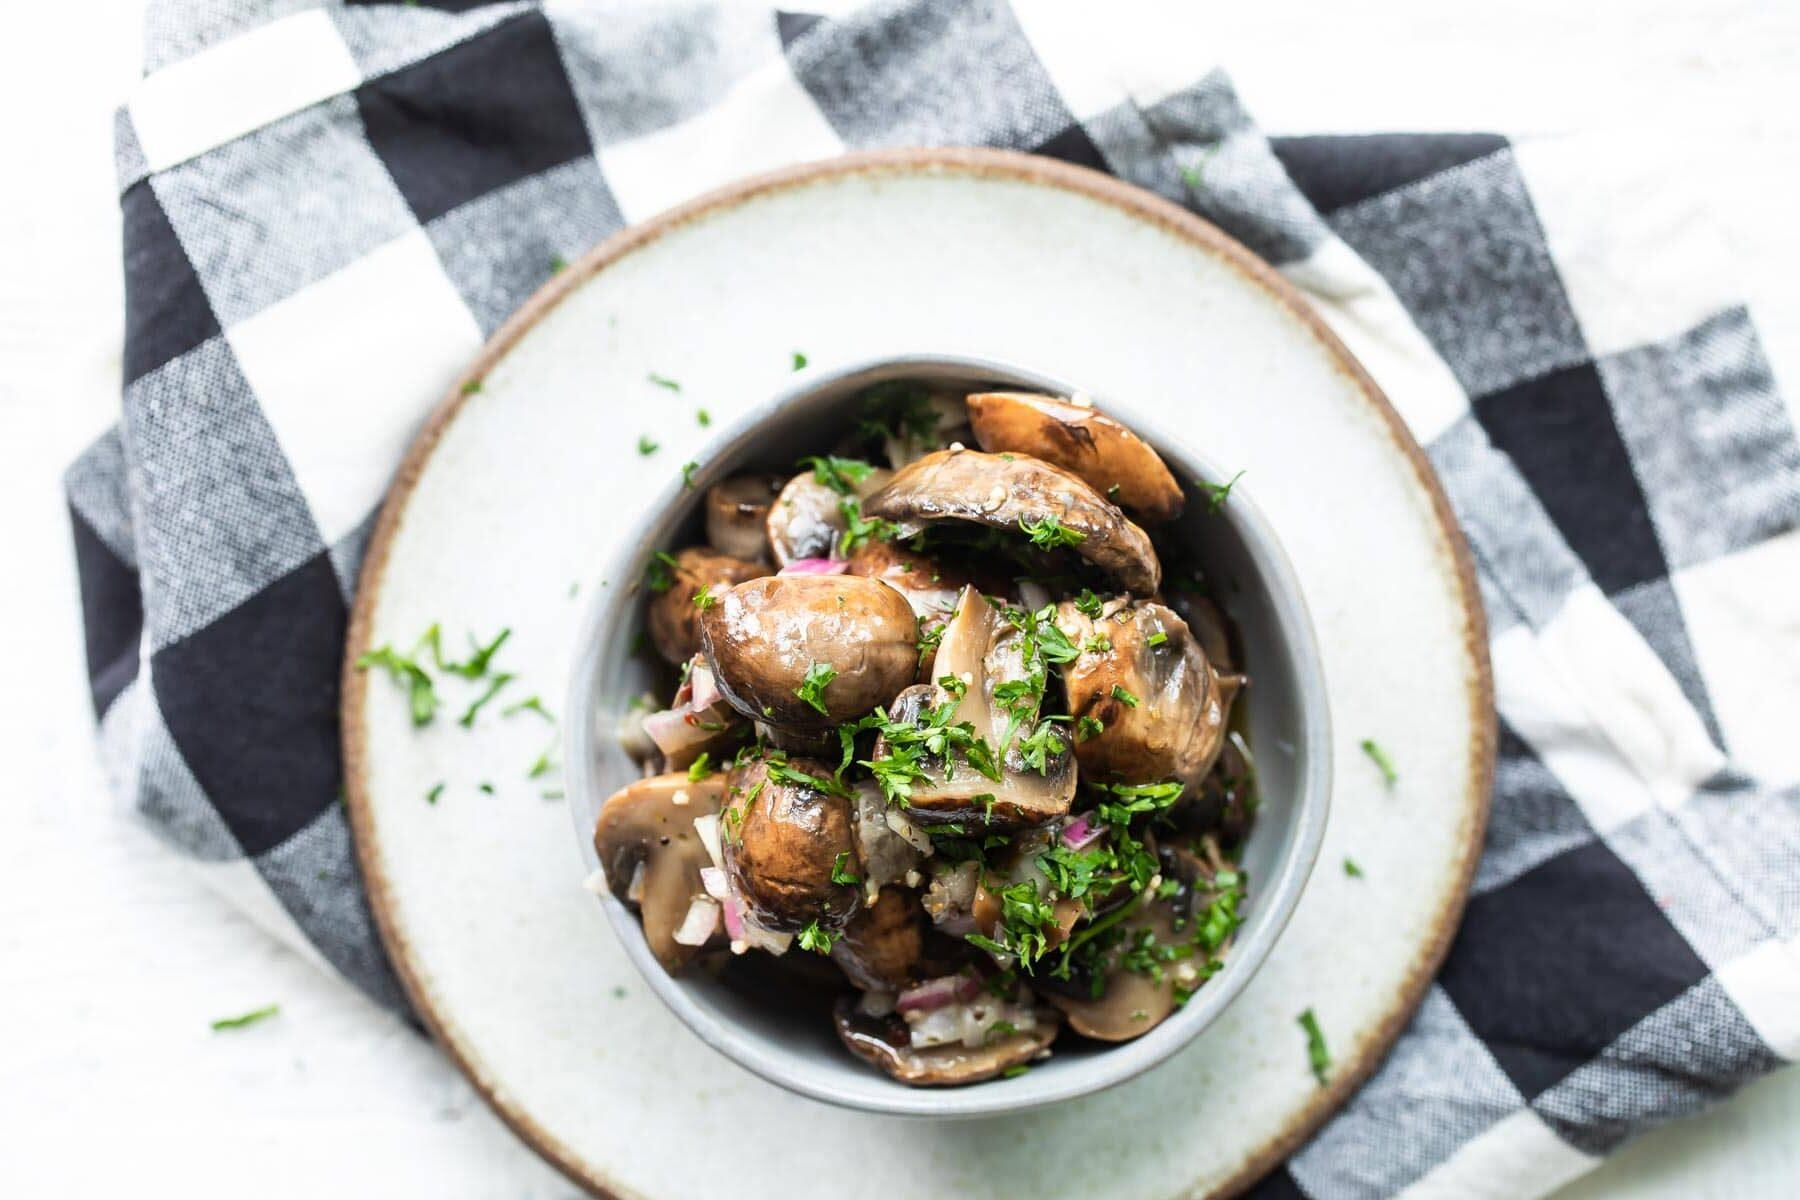 Marinated mushrooms in a gray bowl.